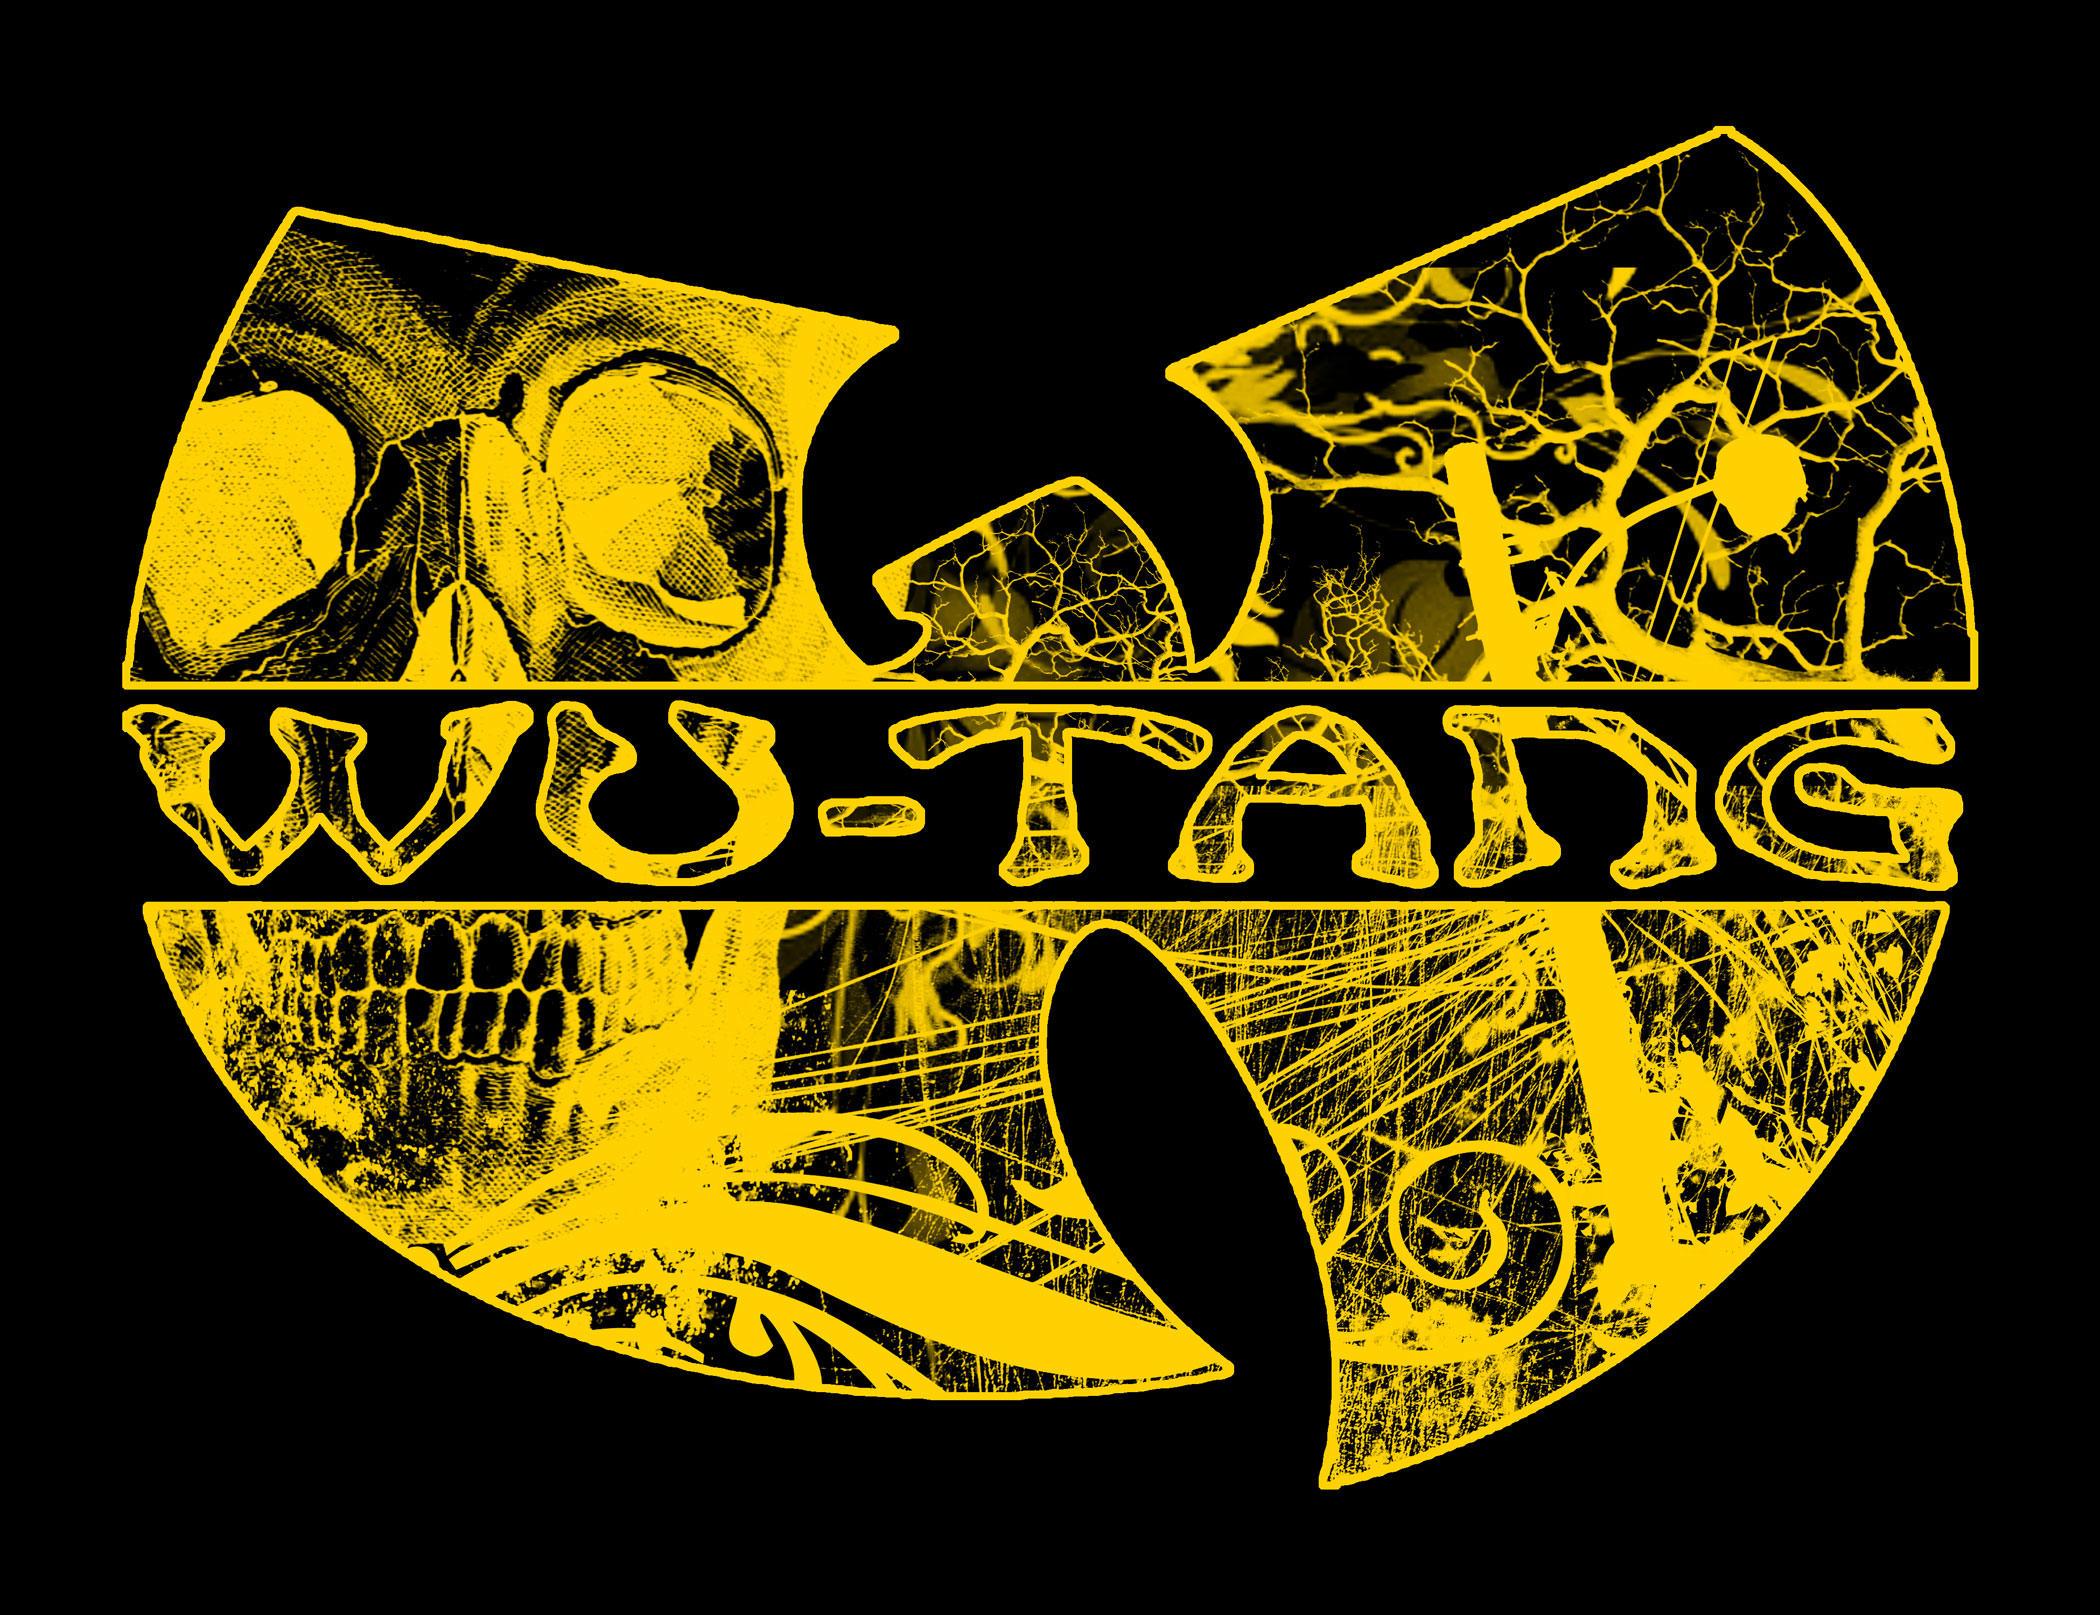 wu-tang-clan-facts